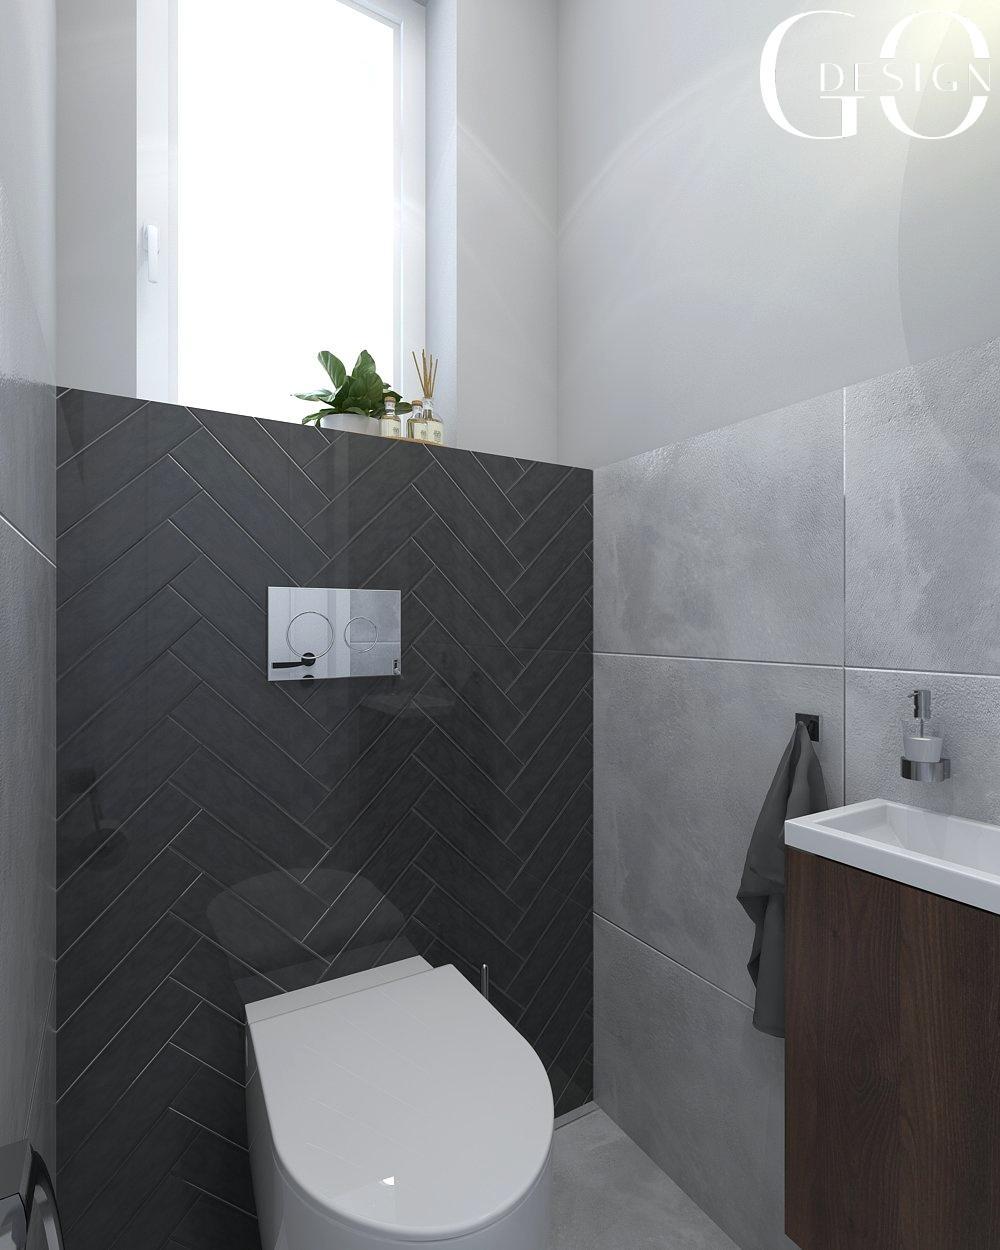 Návrh staromestského bytu v loftovom štýle - Rožňava - Obrázok č. 11